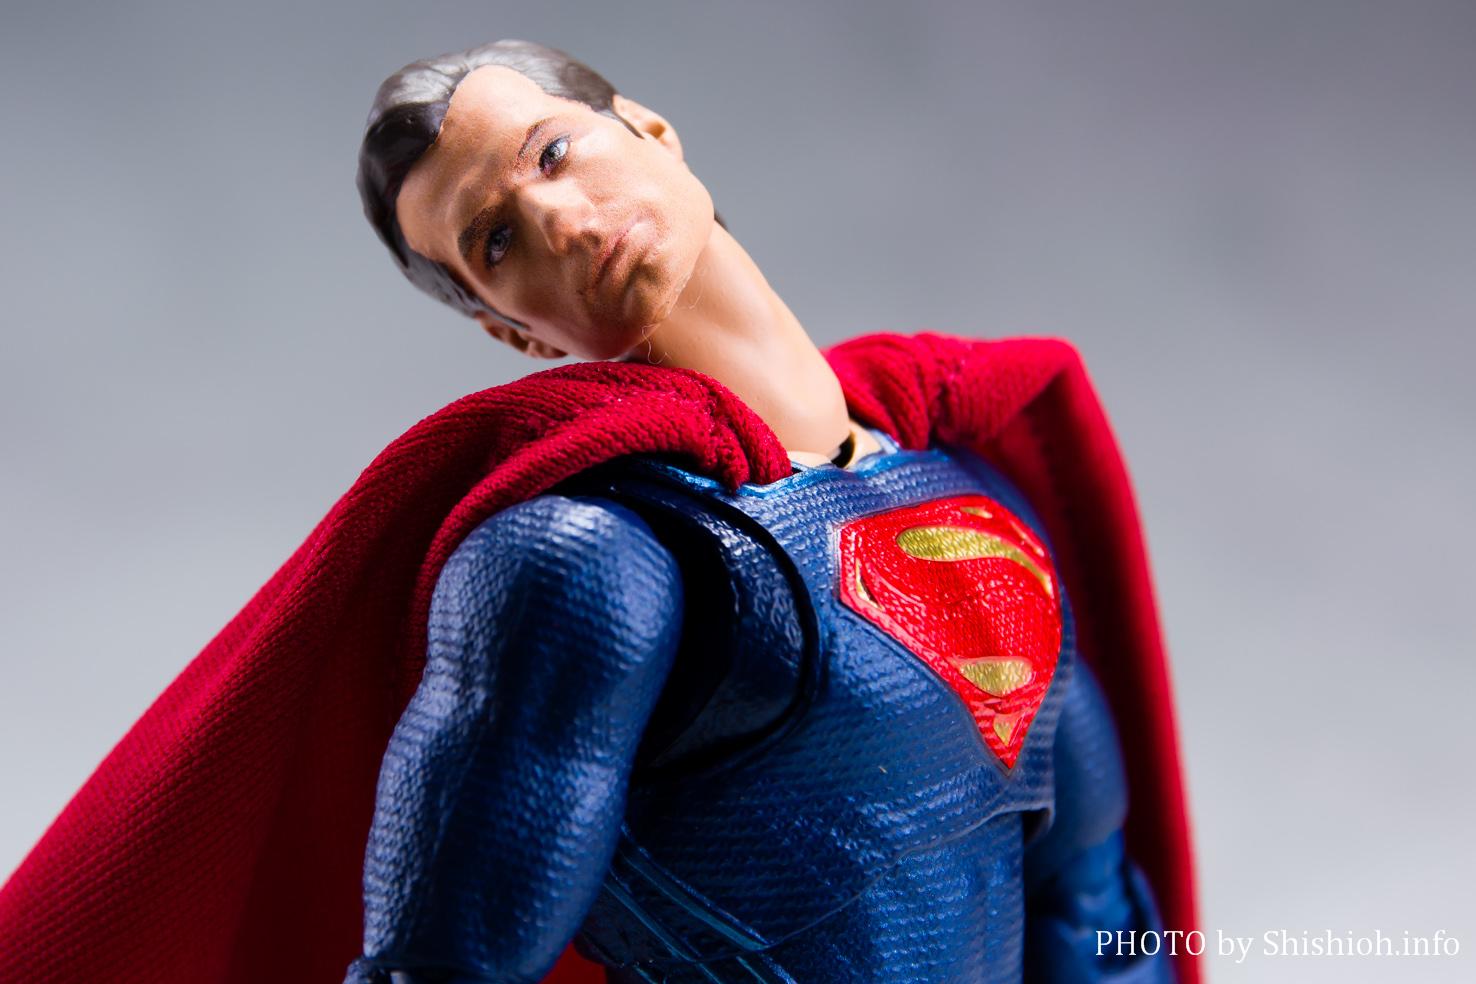 S.H.Figuarts スーパーマン (JUSTICE LEAGUE)